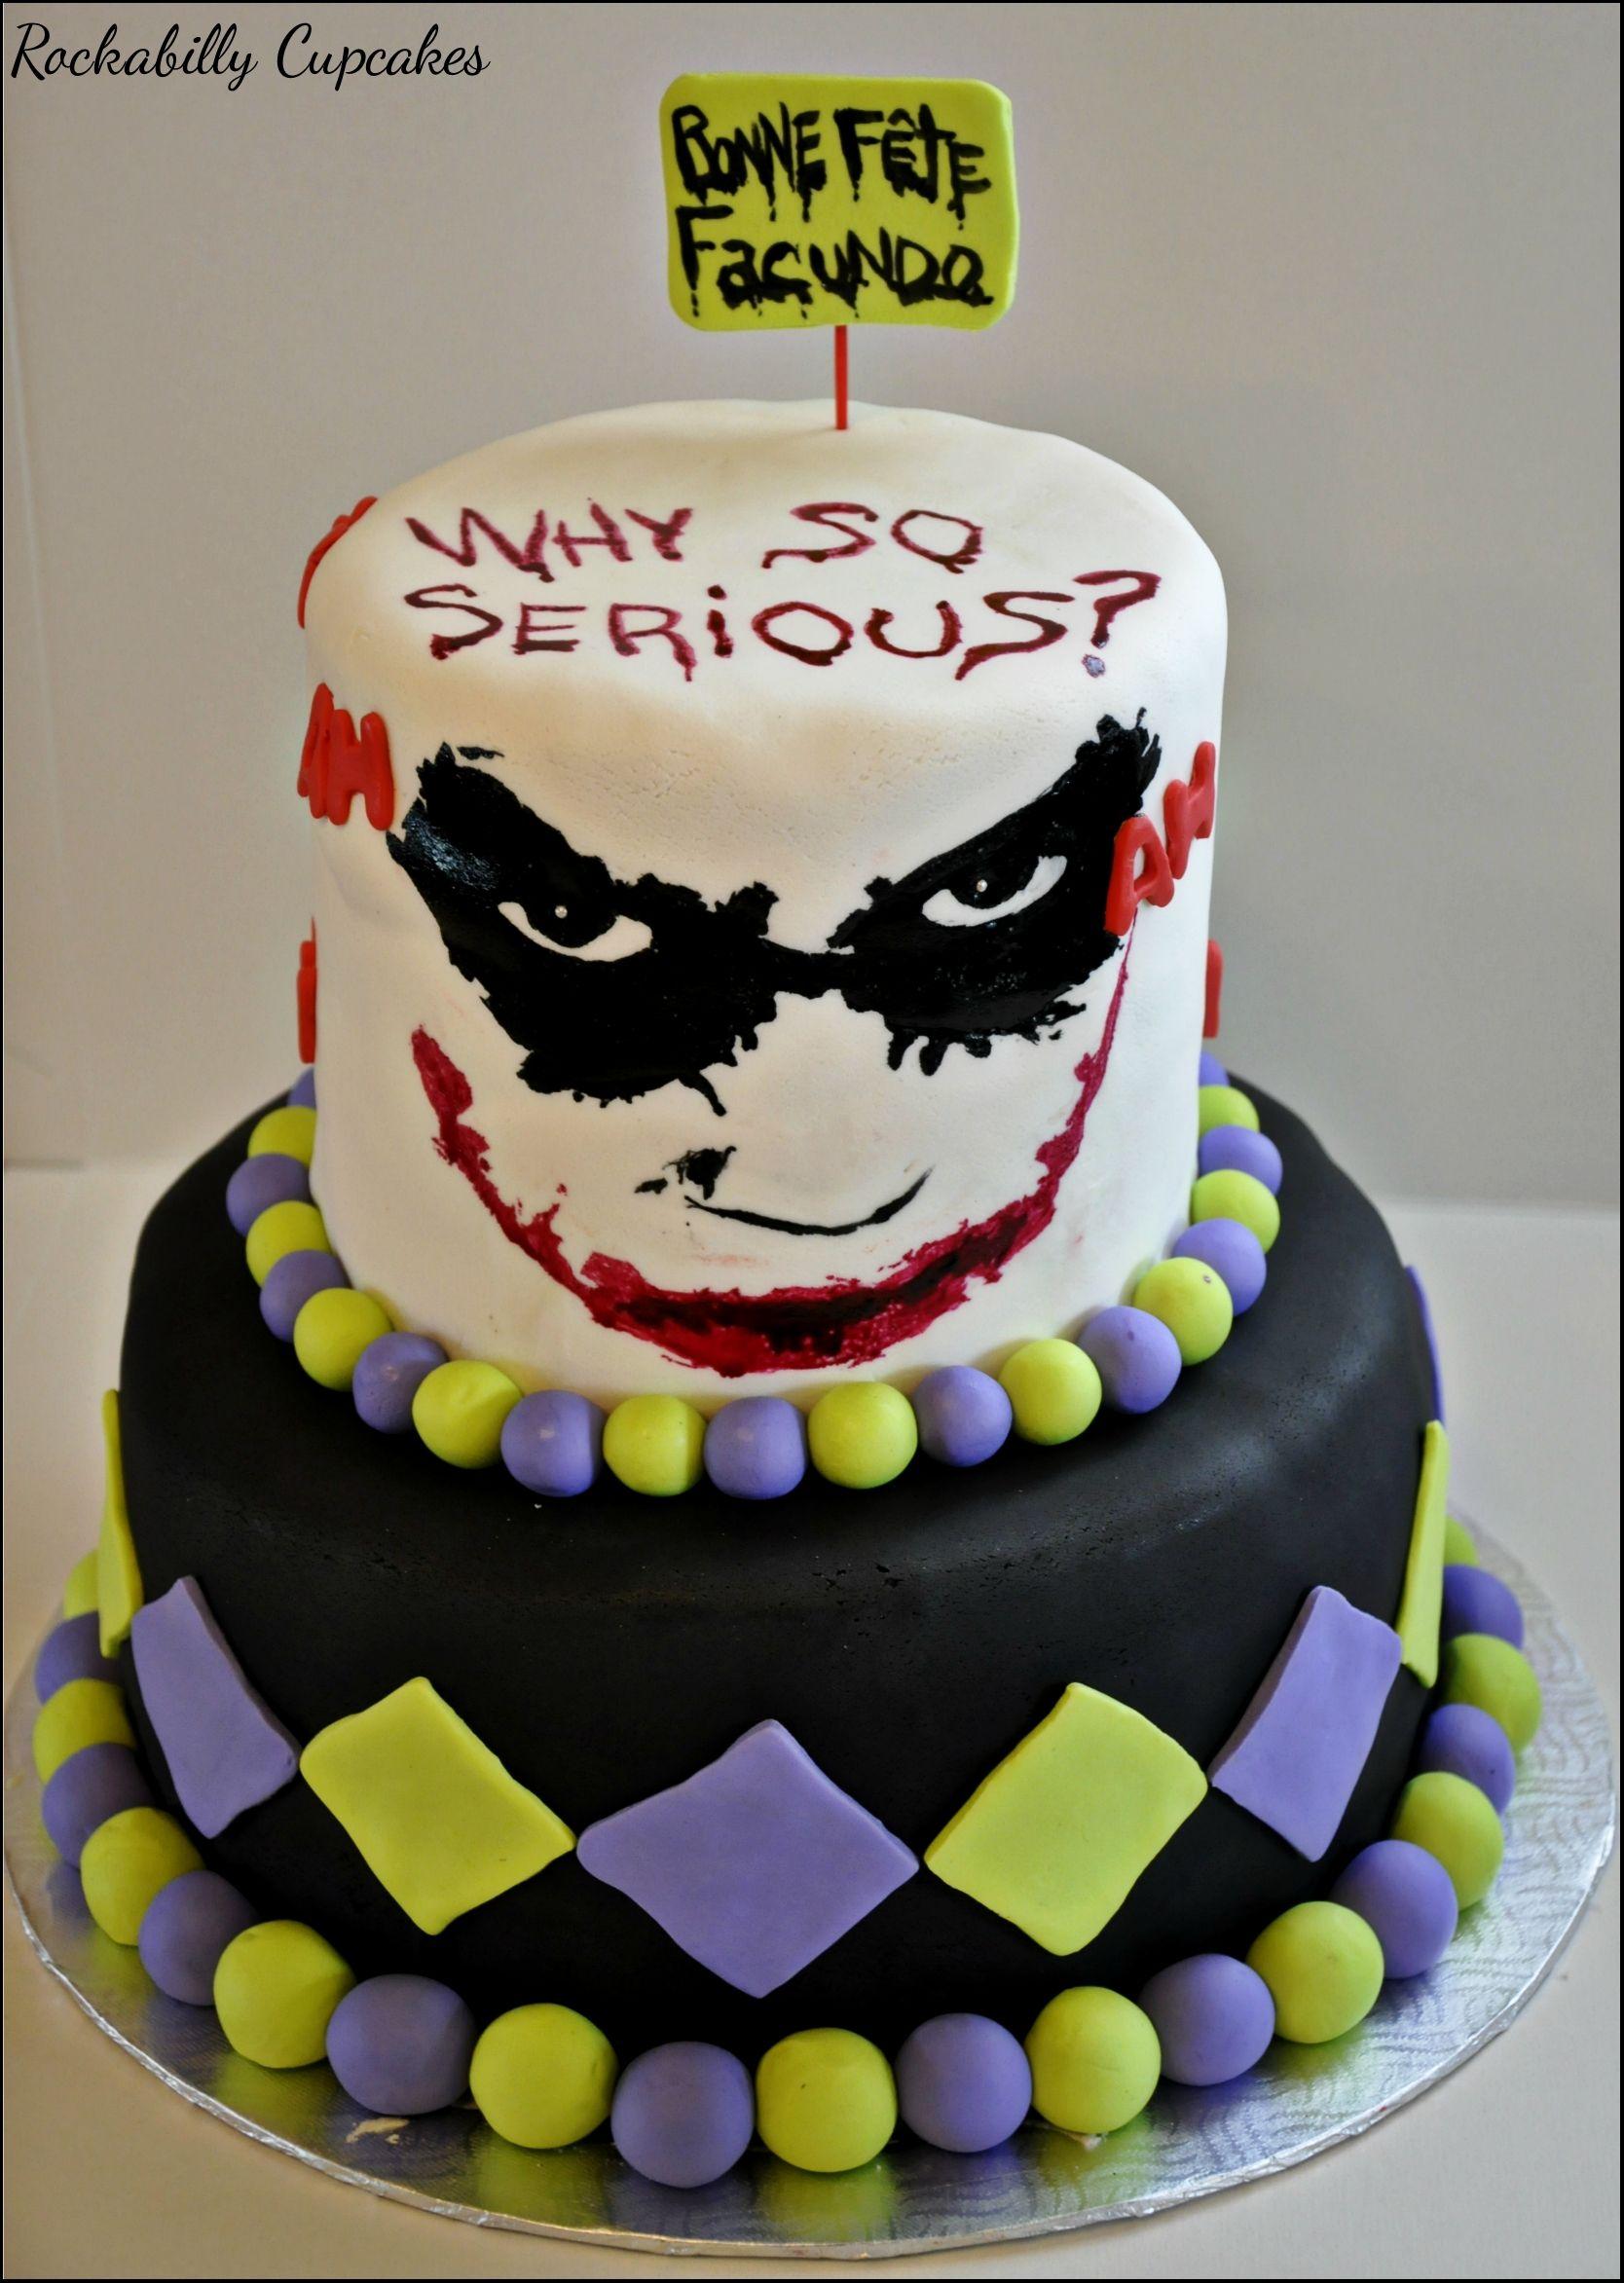 Why So Serious Joker Themed Cake By Rockabilly Cupcakes Www - Rockabilly birthday cake